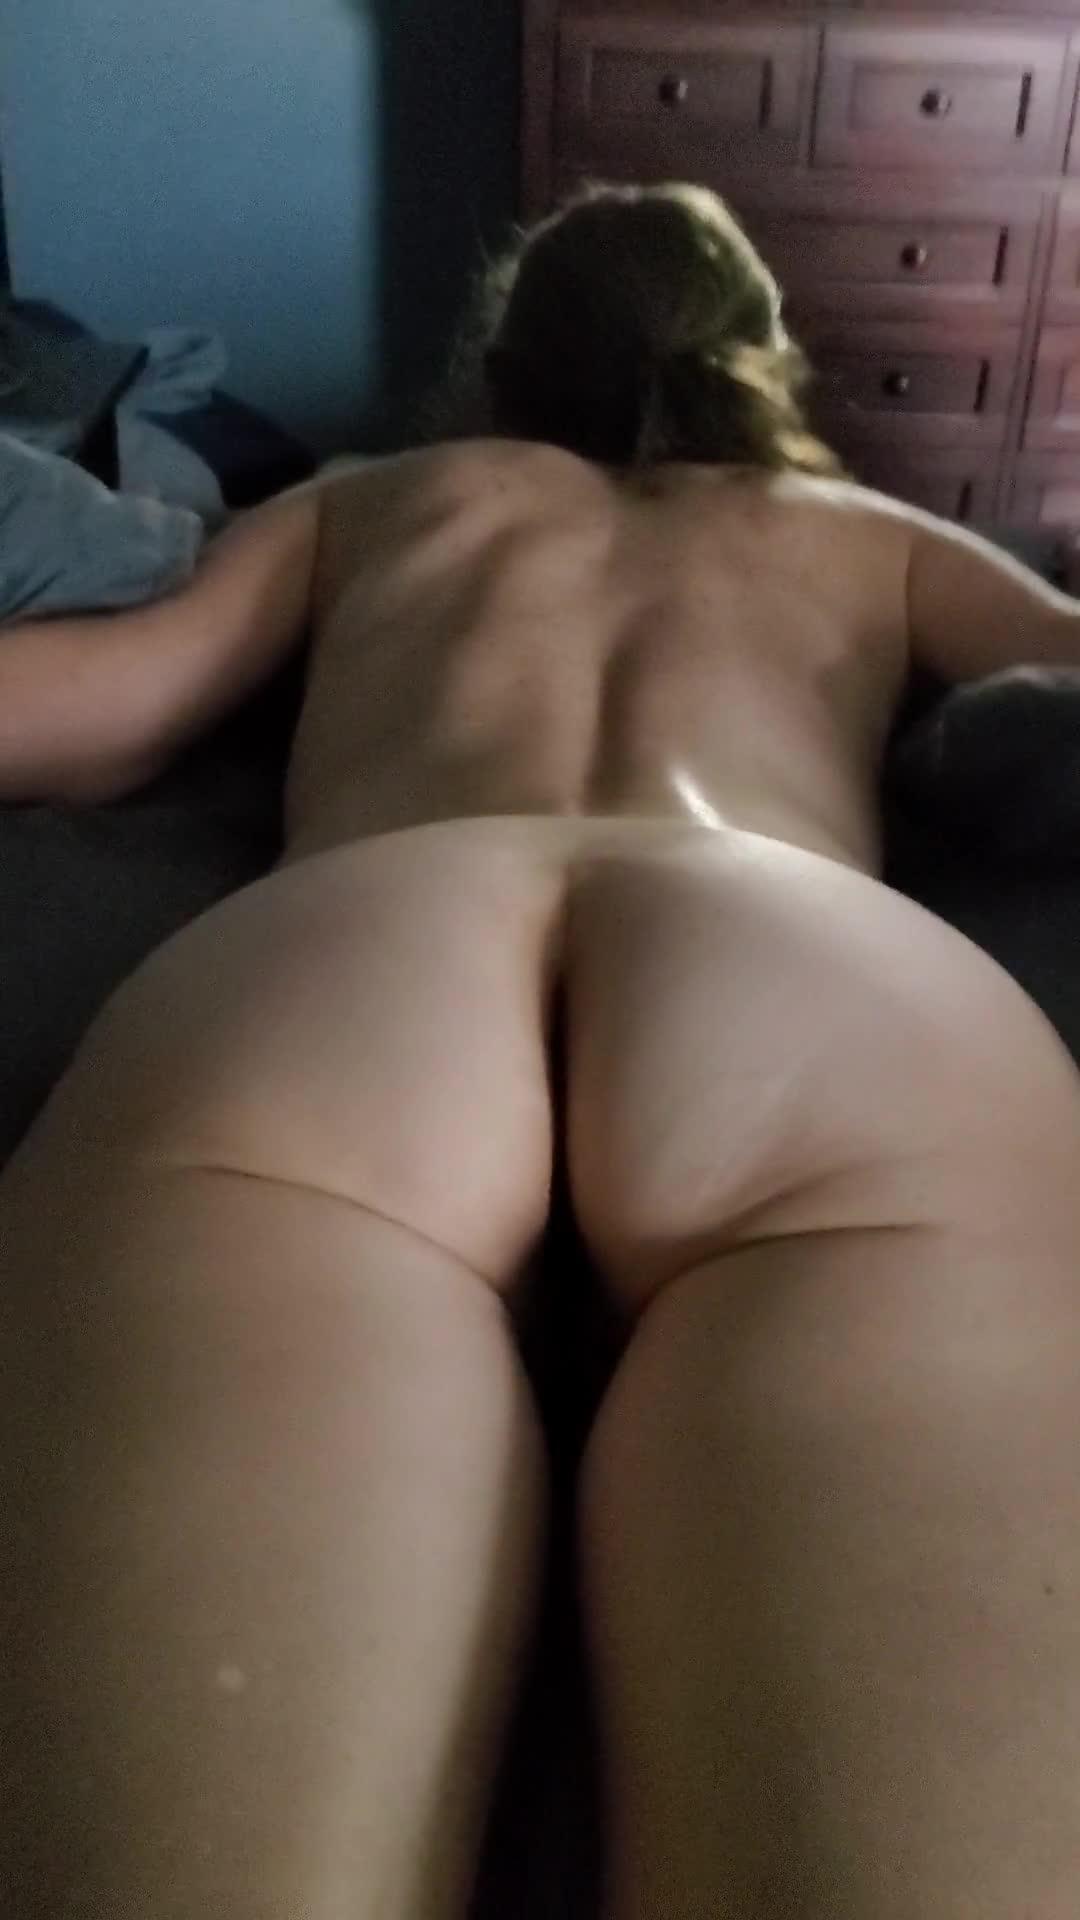 Amanda Crew Desnuda https://www.voyeurweb/contributions/view/3341036